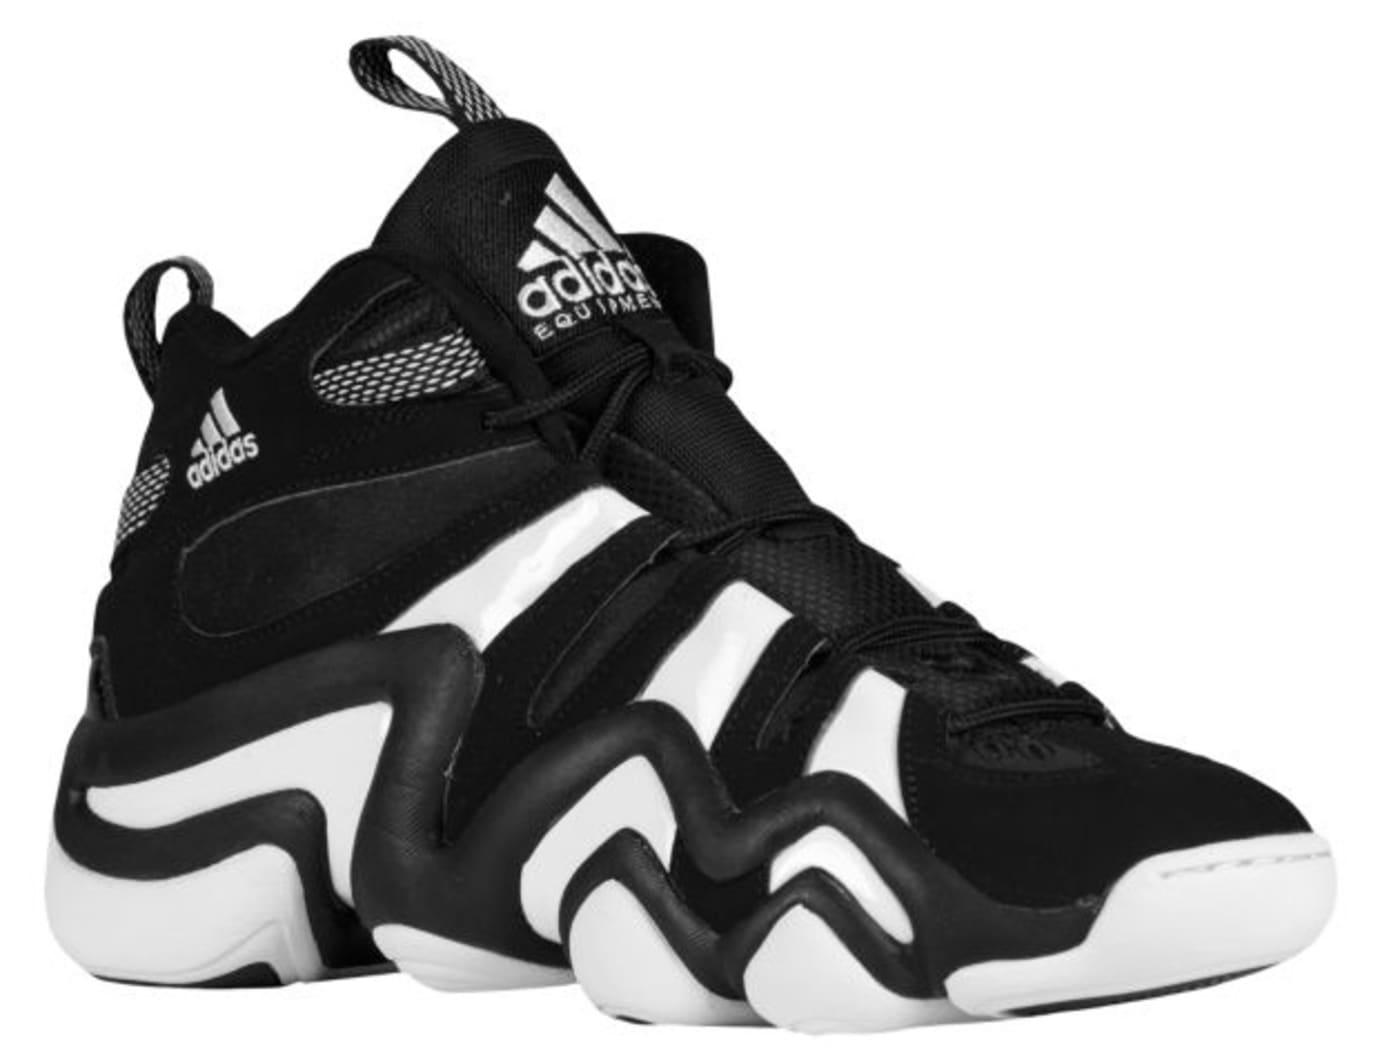 Kobe Kobe Collector Signature Bryant Kobe Collector Signature Bryant SneakersSole Bryant SneakersSole tChQsrd